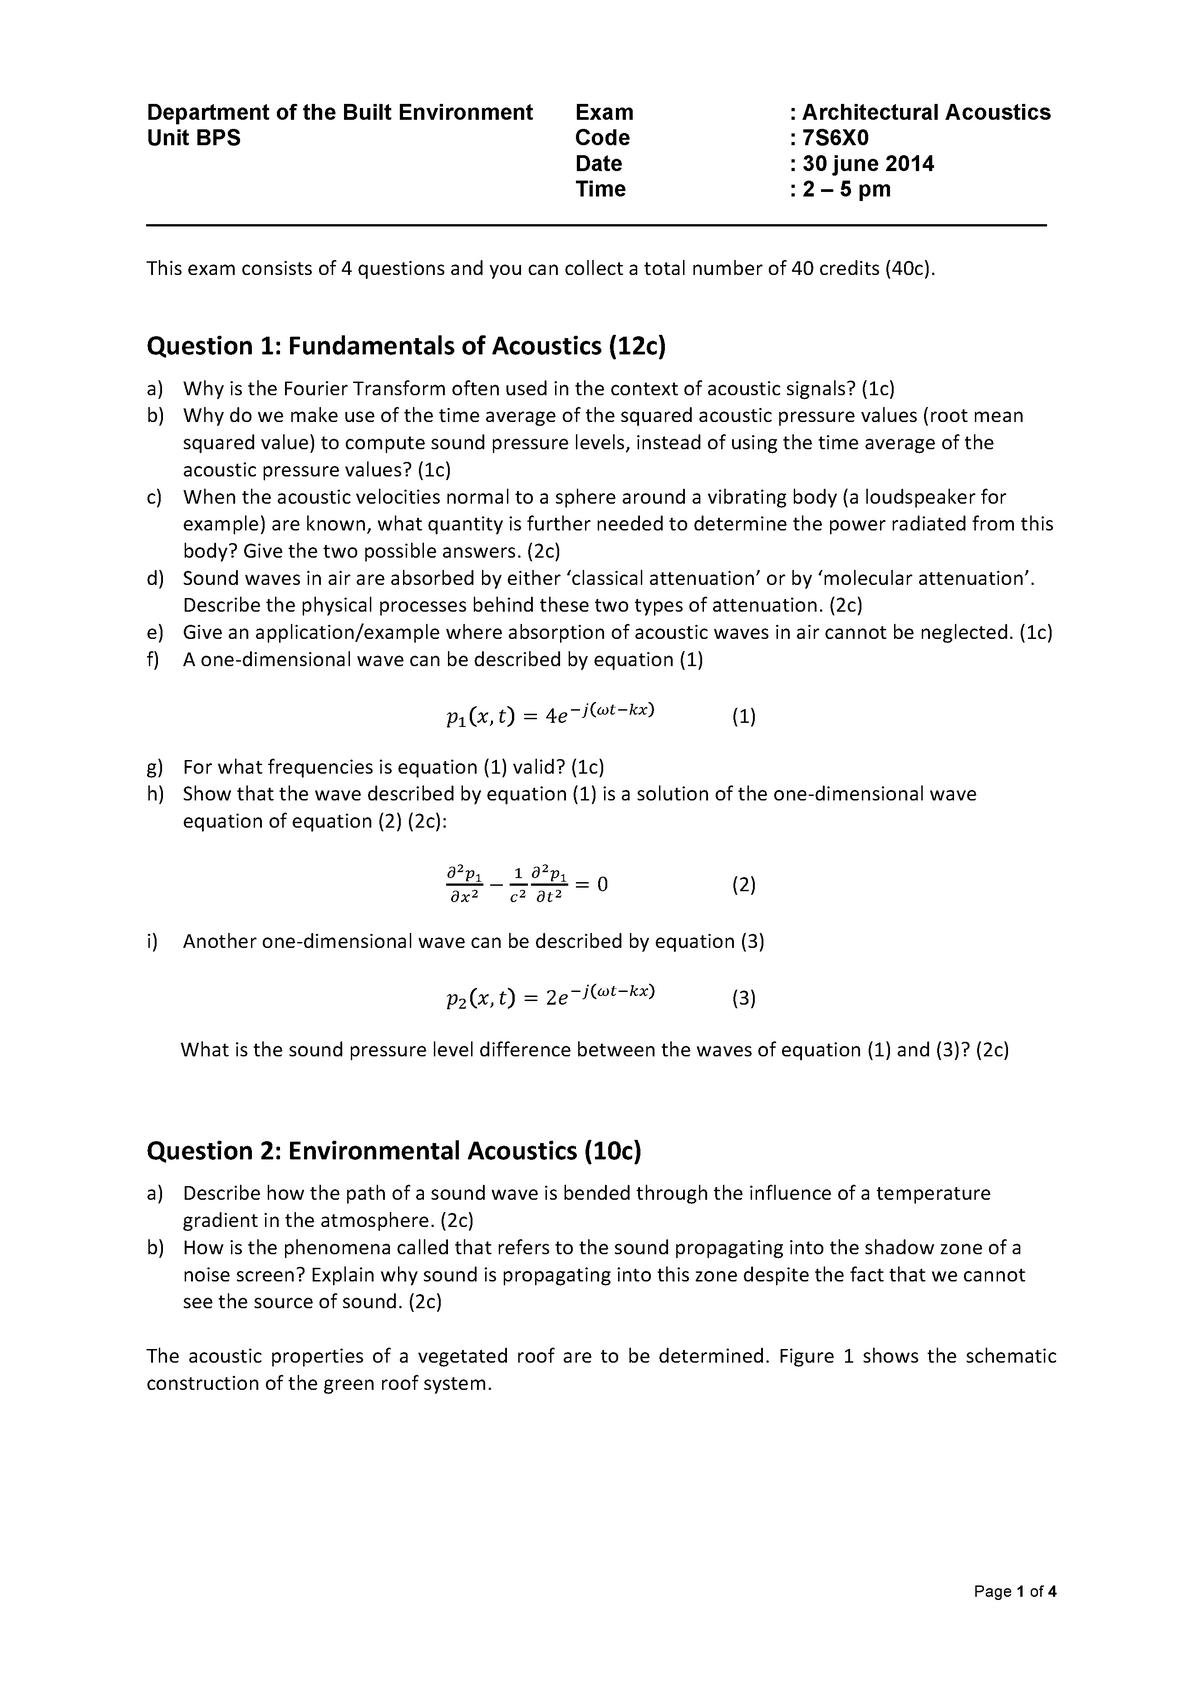 7S690 exam 2014-06-30 - 7LS8M0: Architectural acoustics - StuDocu